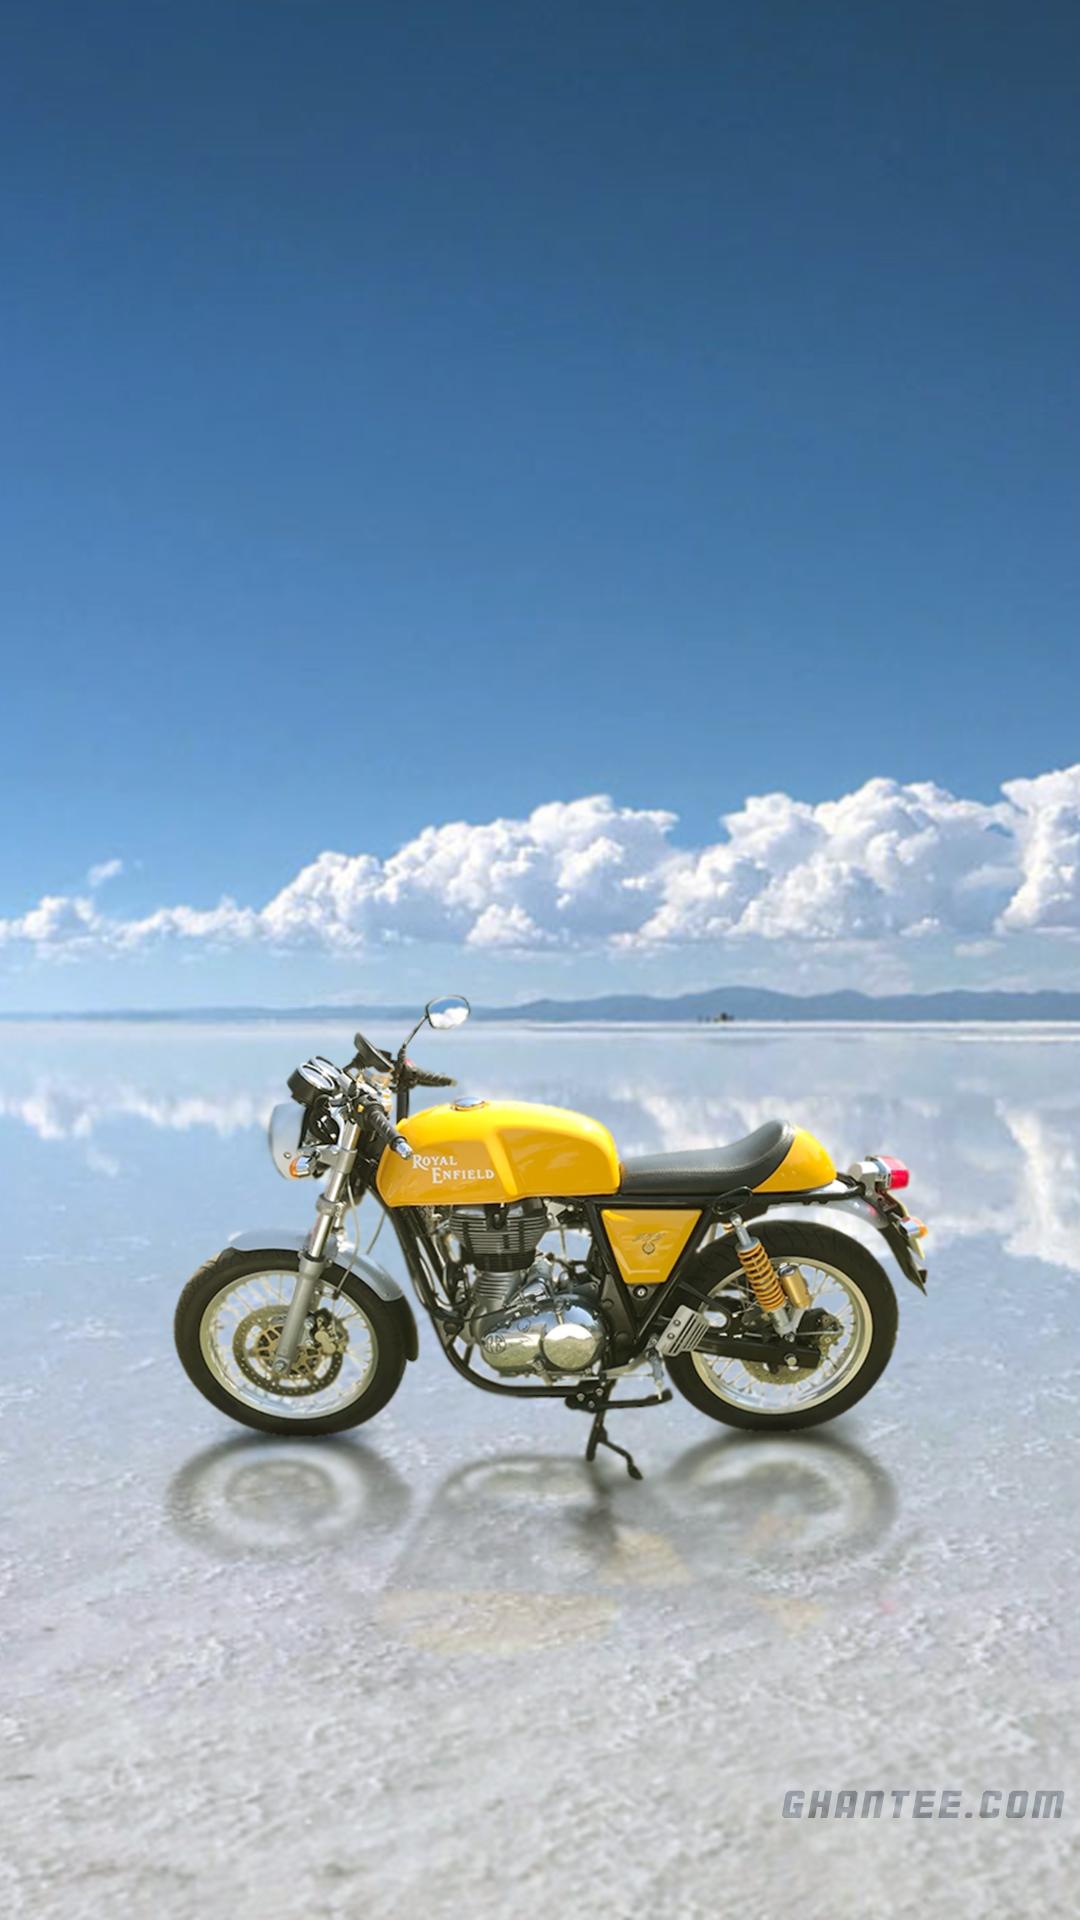 royal enfield bullet bike hd phone wallpaper | yellow